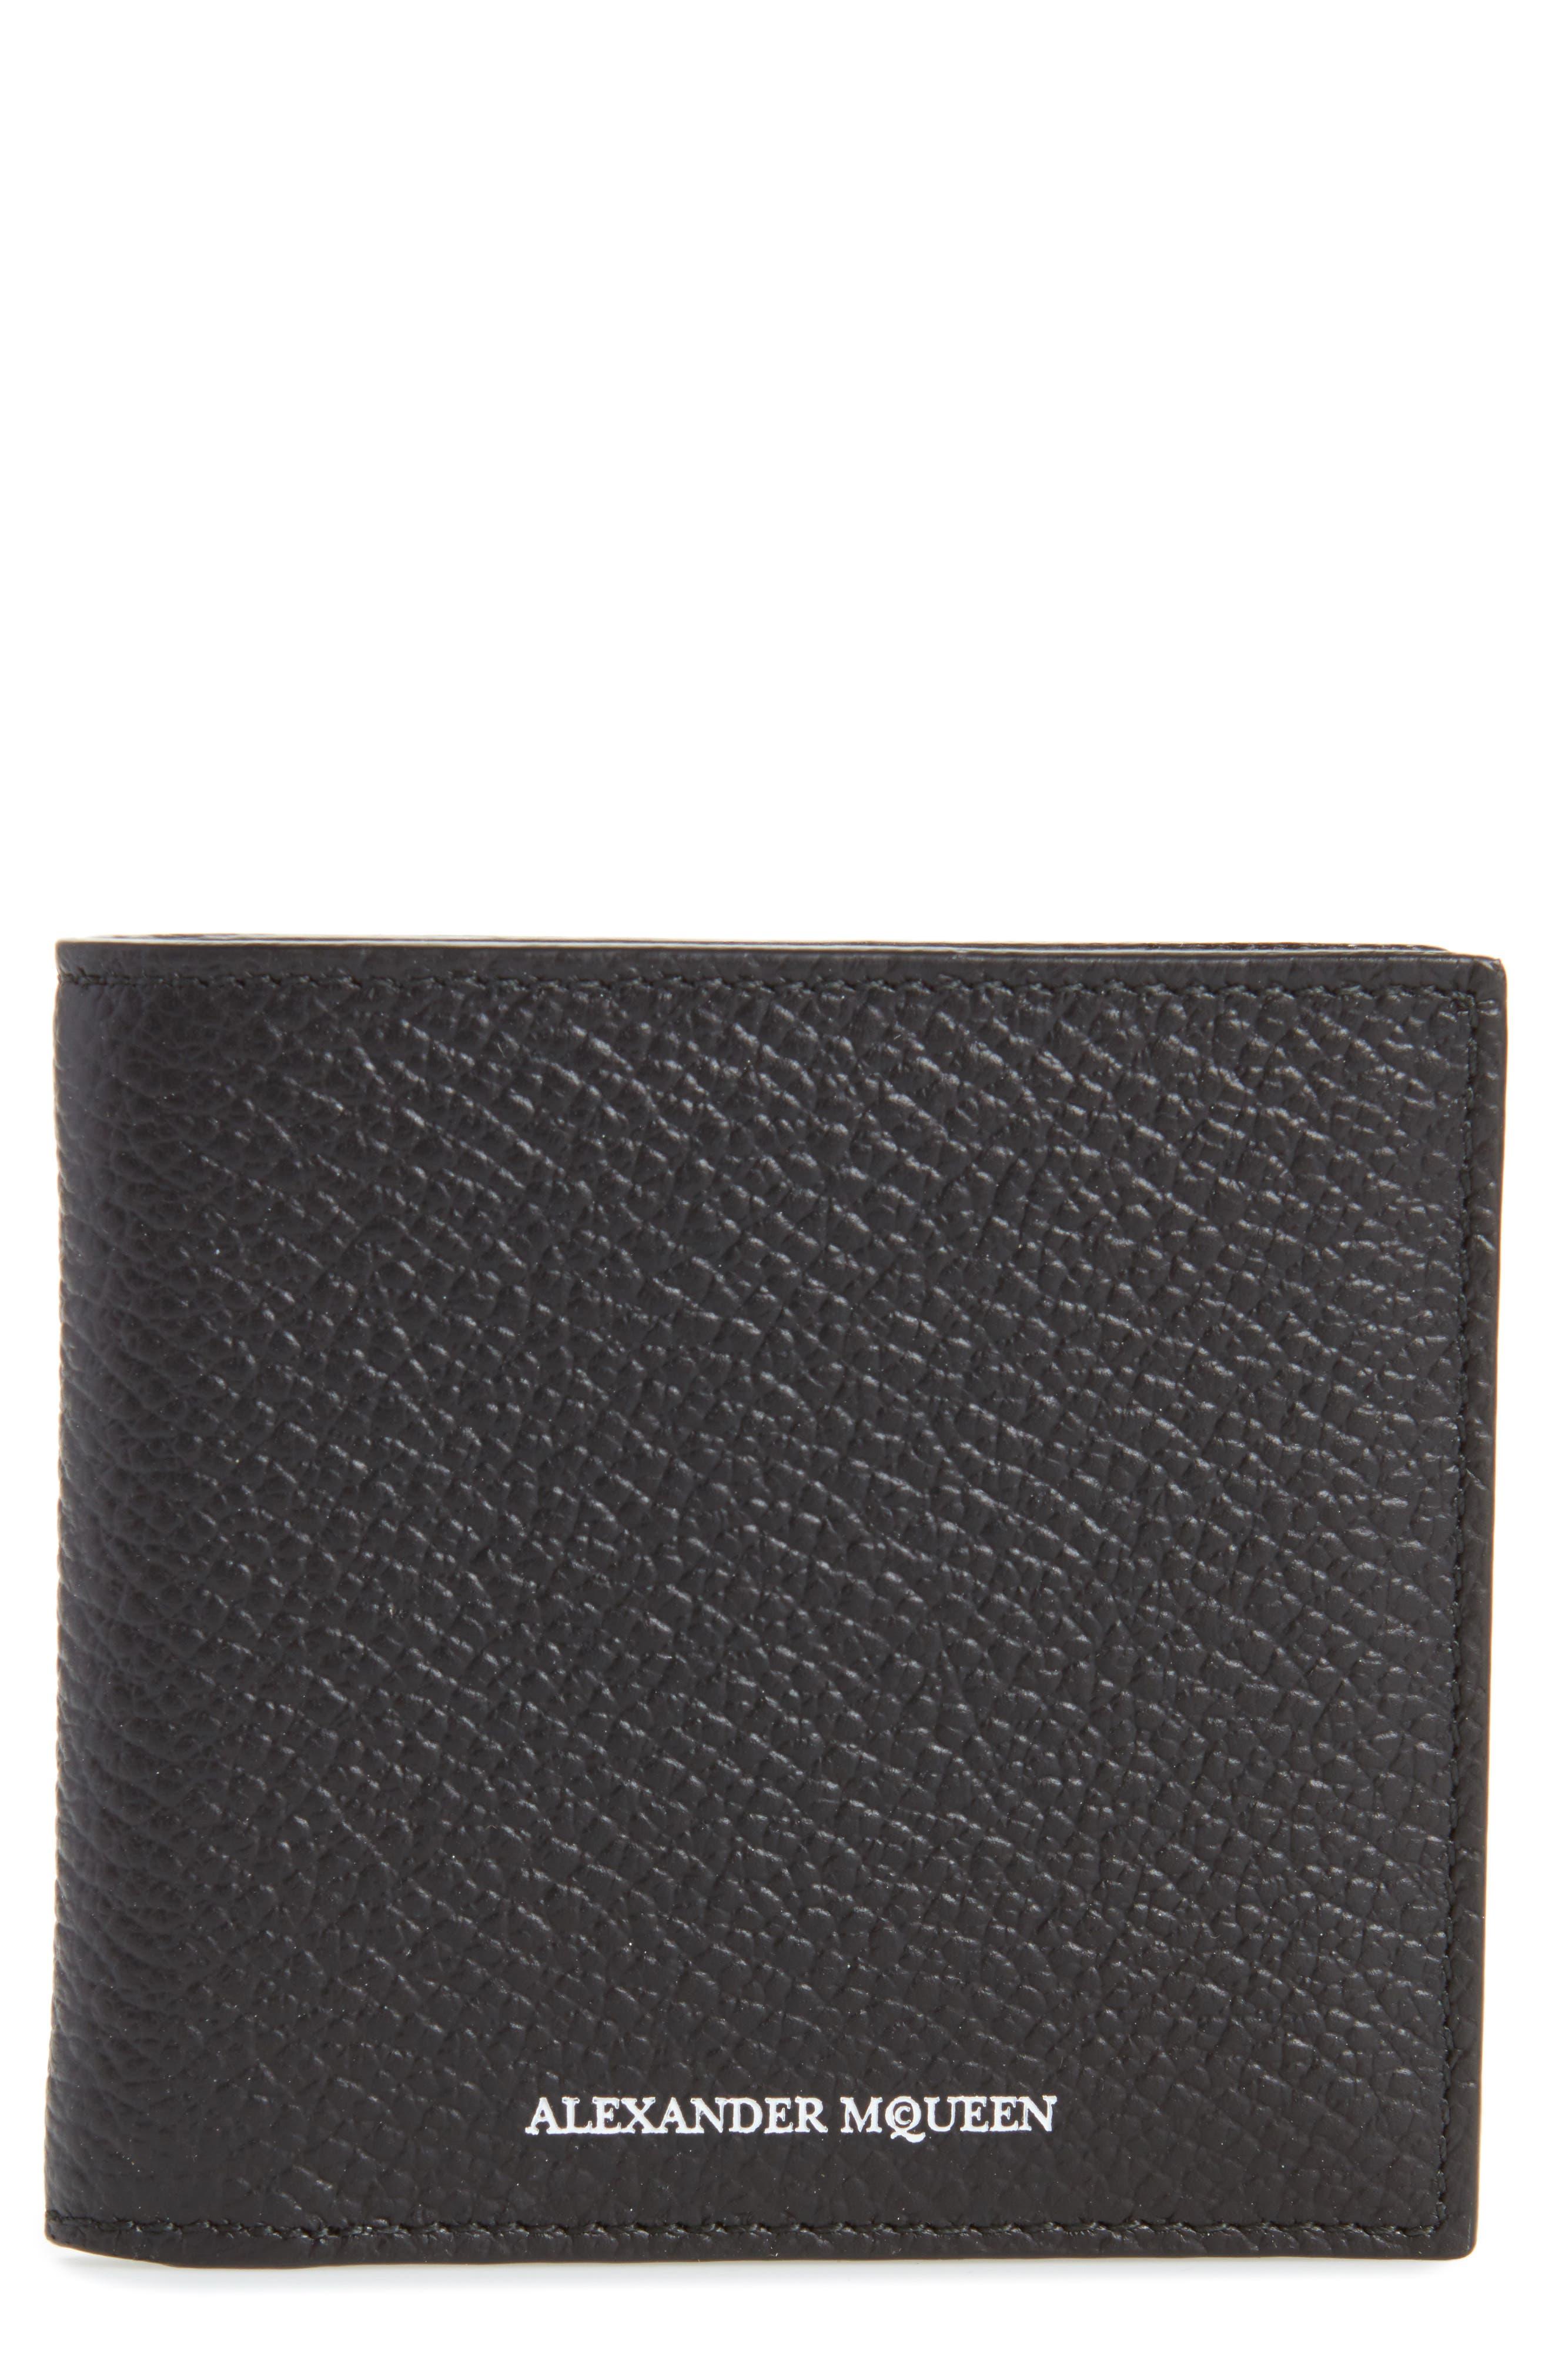 Main Image - Alexander McQueen Leather Billfold Wallet